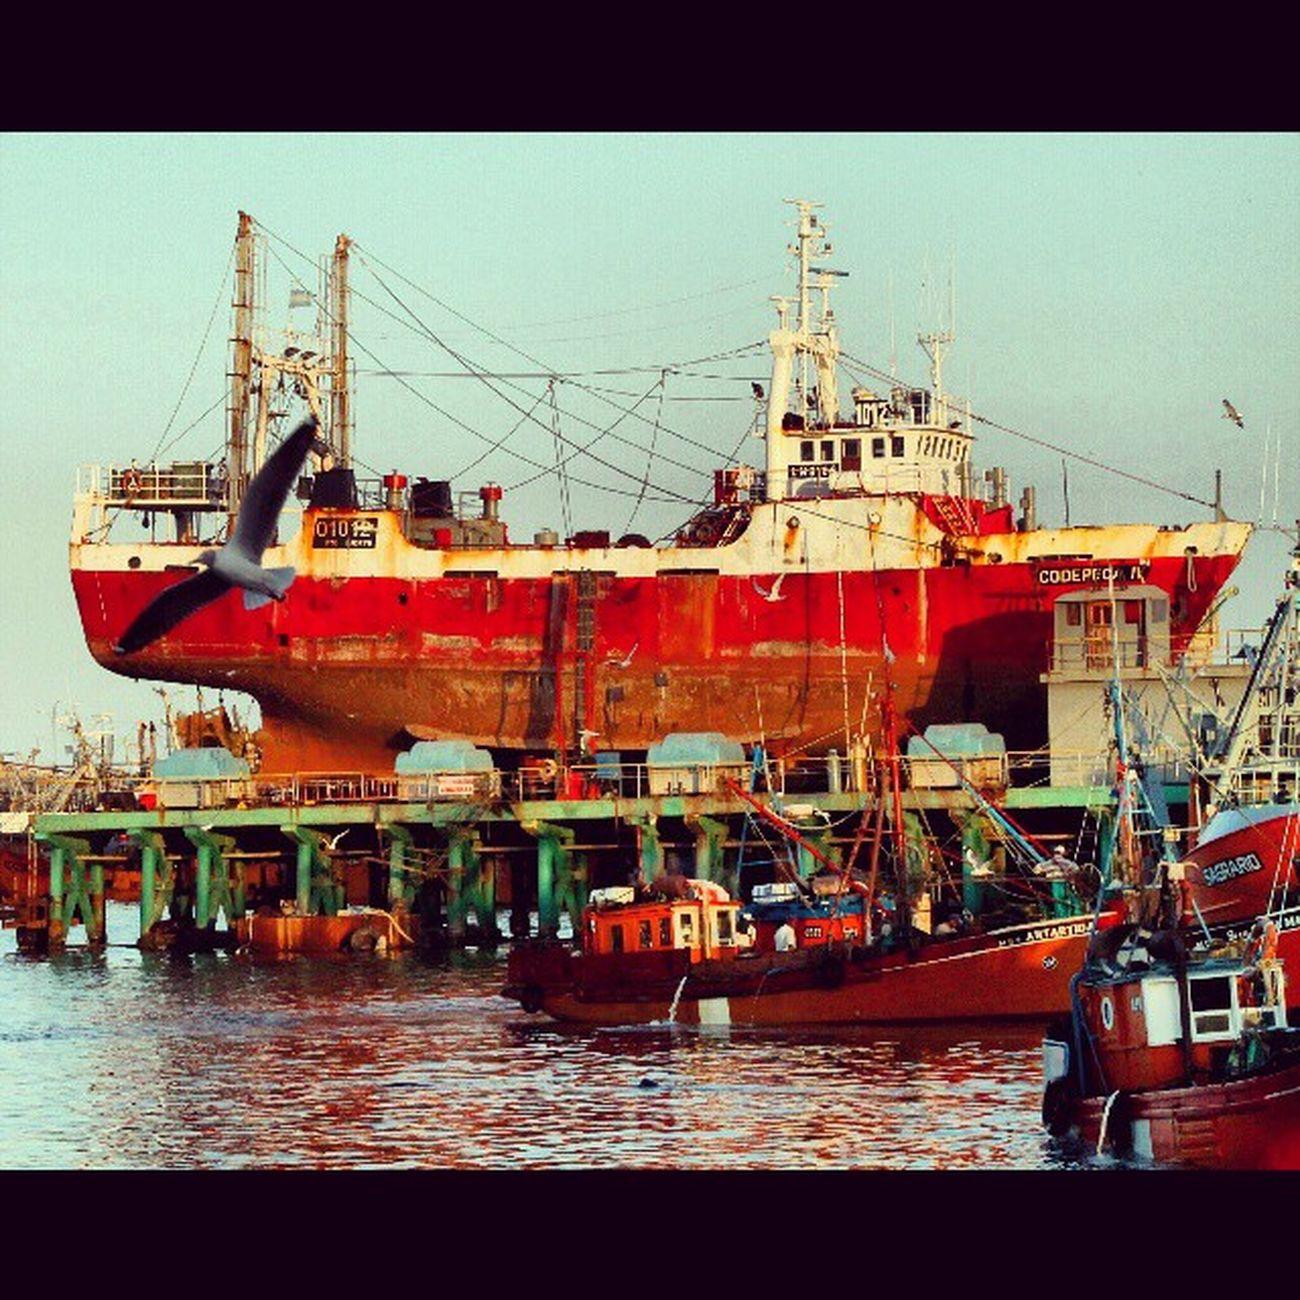 Puerto de Mar del Plata Puerto Port Harbor Gaviota Seagull Pesca Fishing Mardel